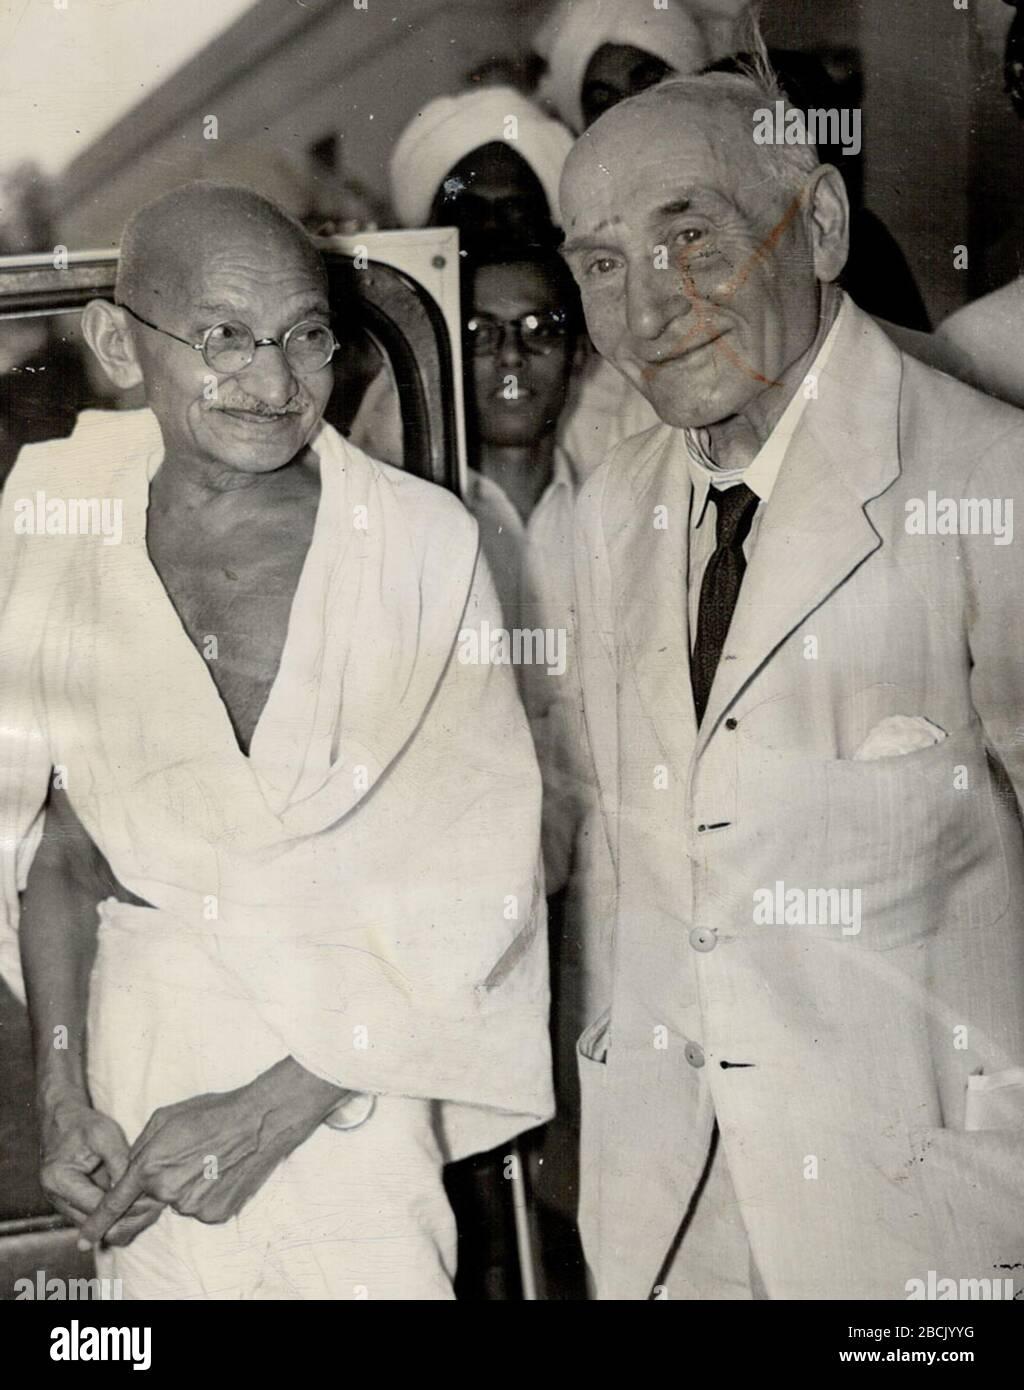 'Anglais: Mahatma Gandhi avec Lord Pethick-Lawrence, à Delhi.; 18 avril 1946; https://www.news18.com/photogallery/india/mahatma-gandhi-100-rare-photos-you-must-see-1645549-2.html lien direct; inconnu (voir [1]); ' Banque D'Images